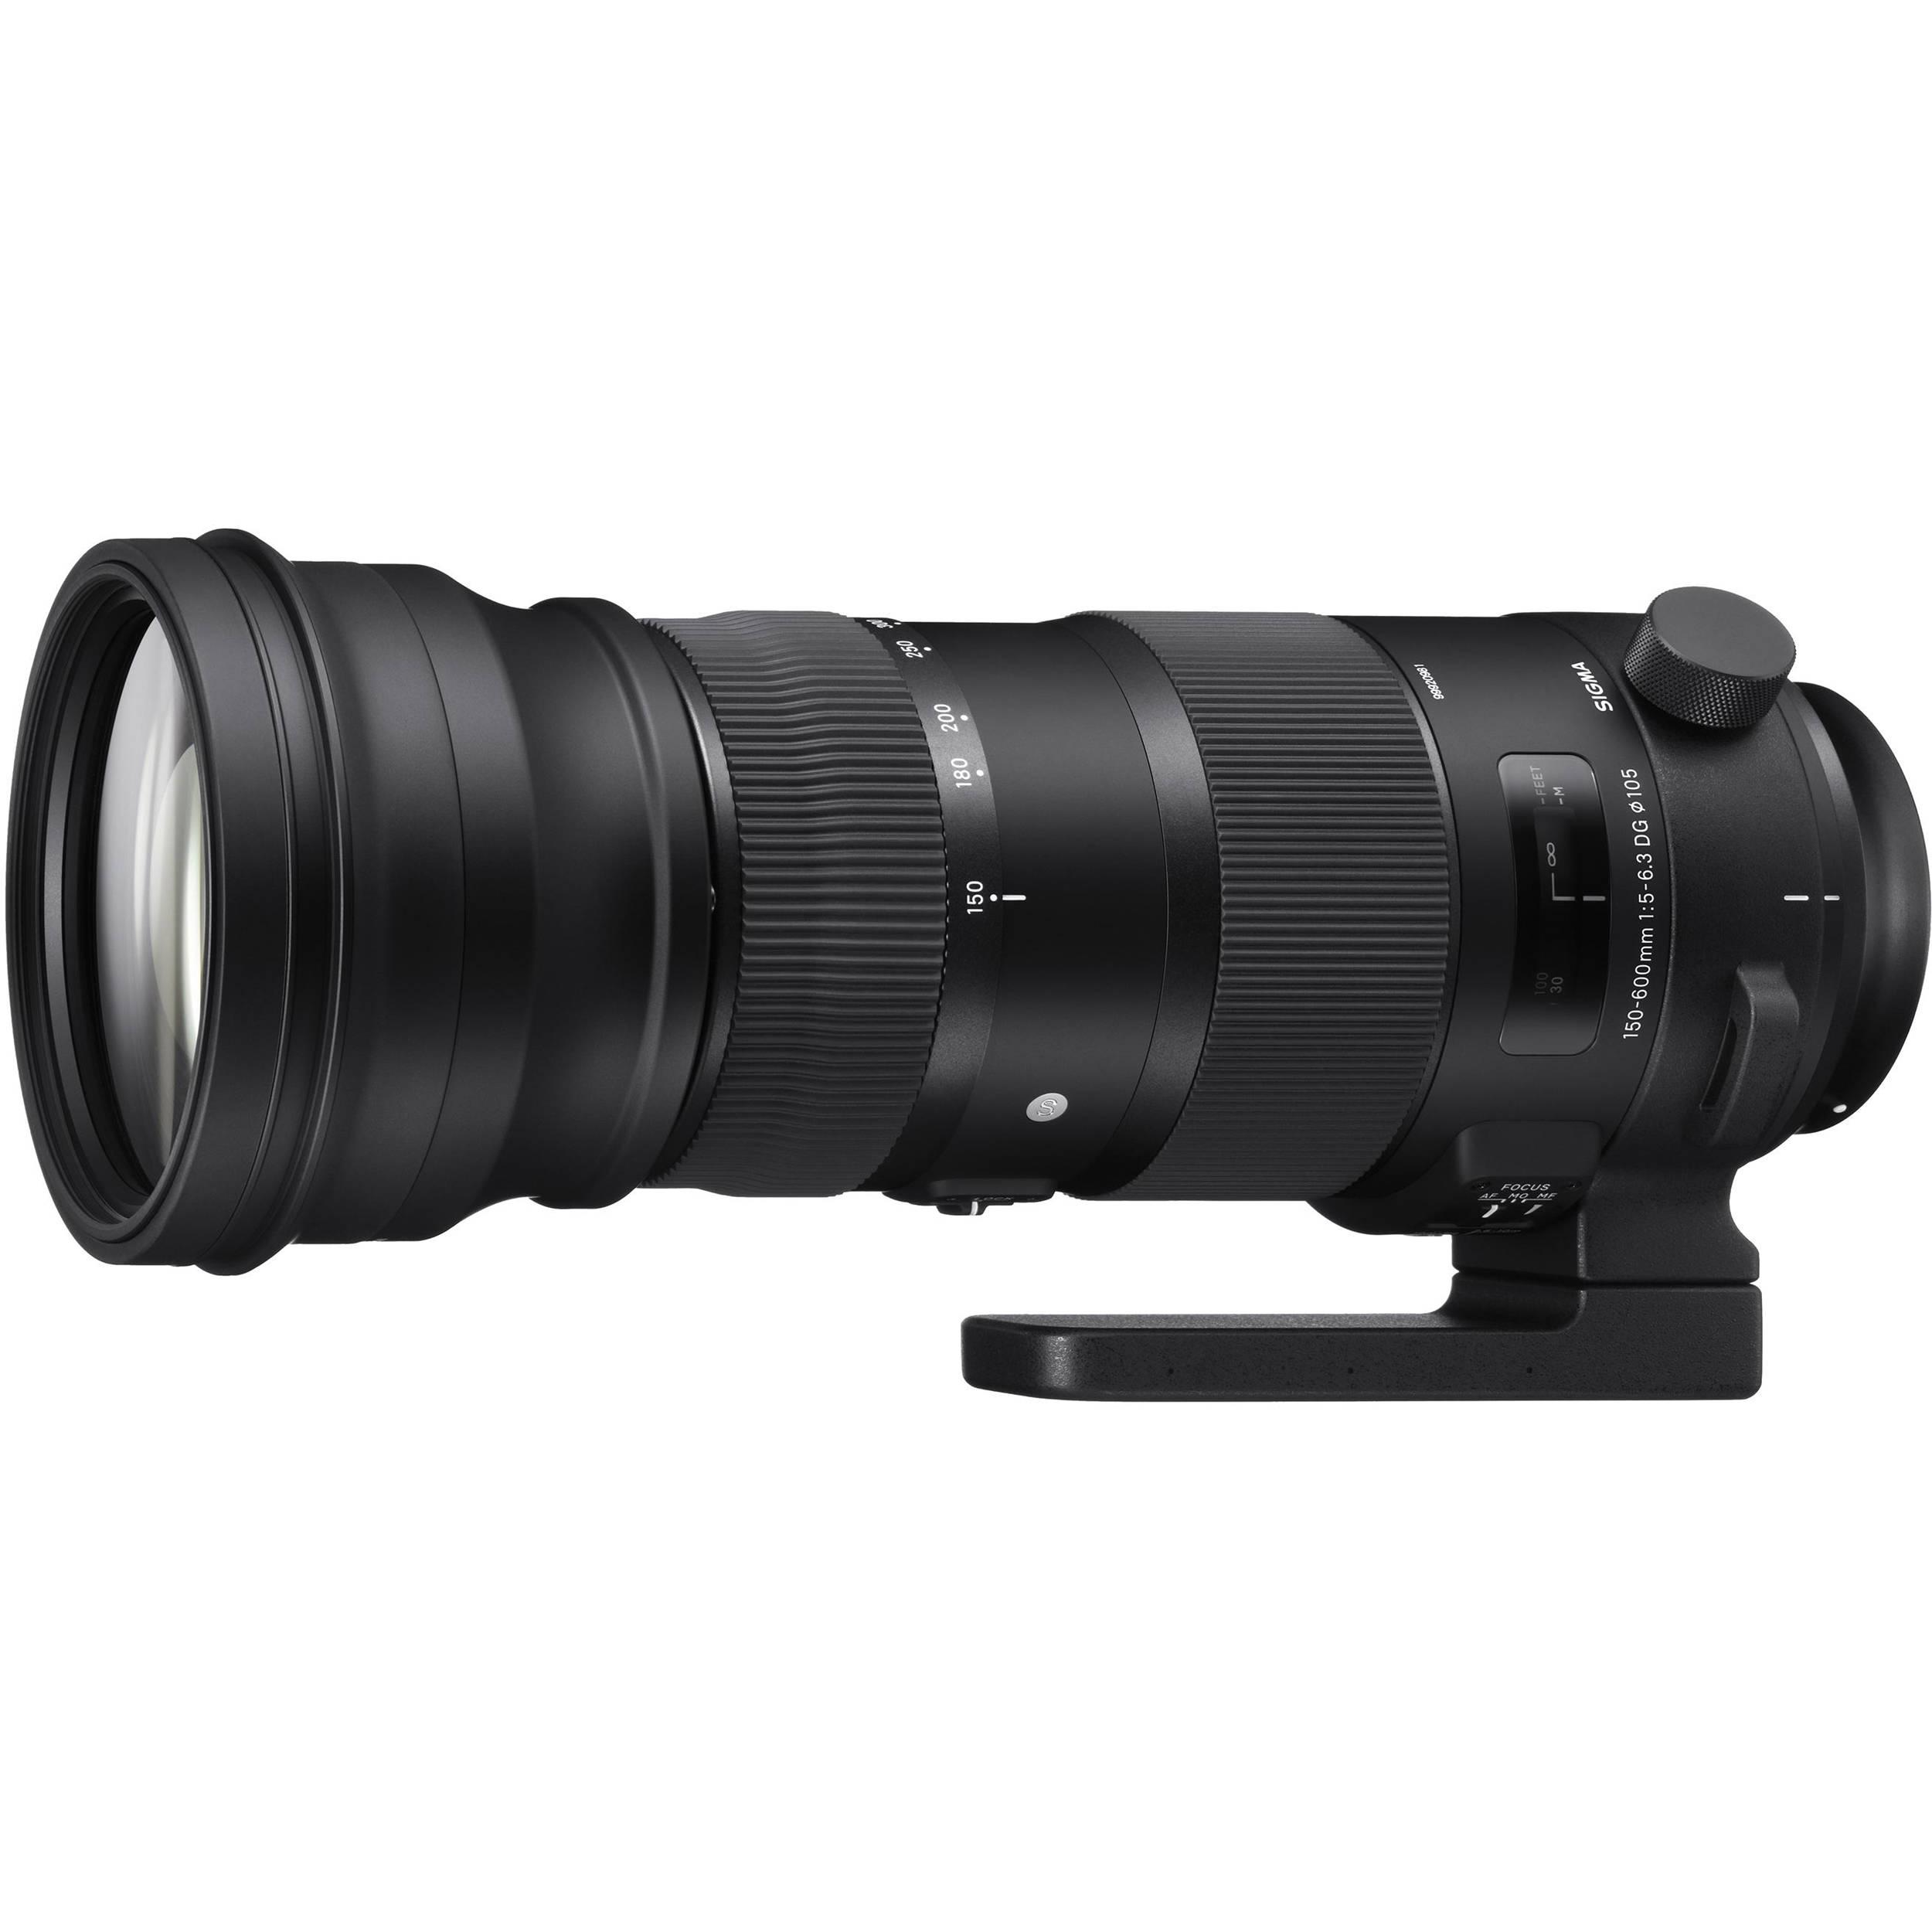 Sigma 150 600Mm F 5 6 3 Dg Os 1082152